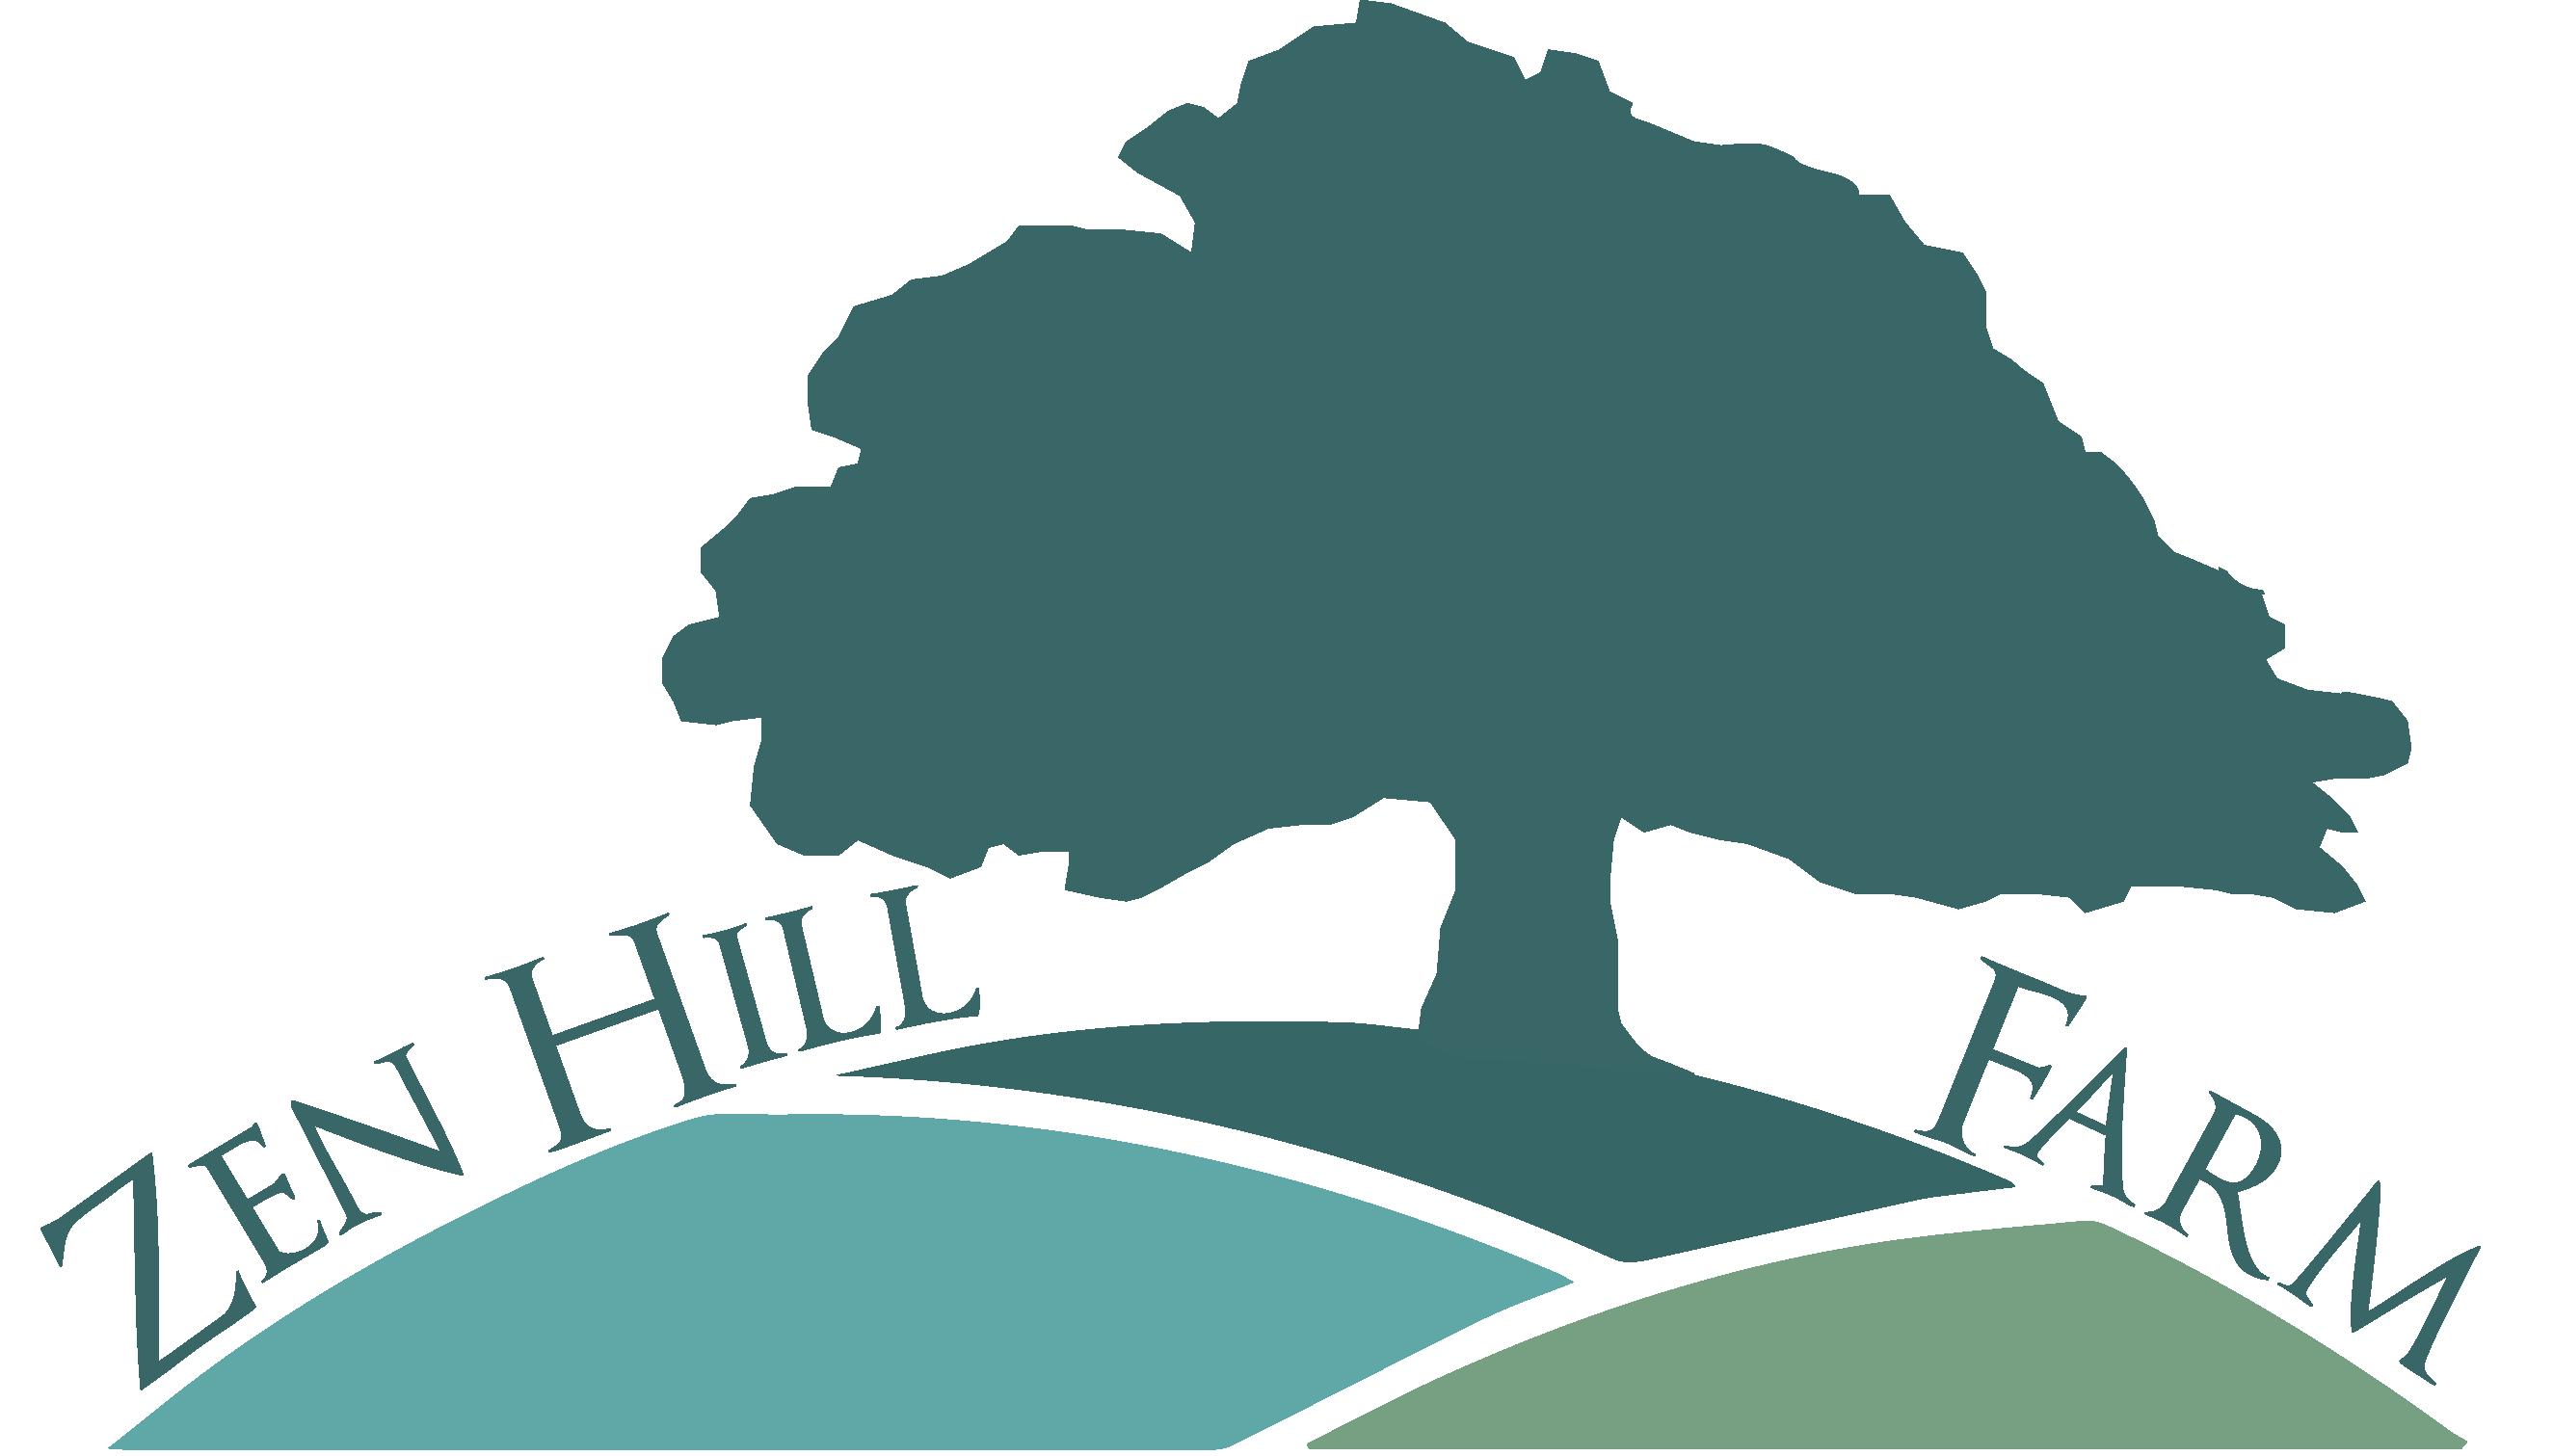 Zen Hill Farm Logo